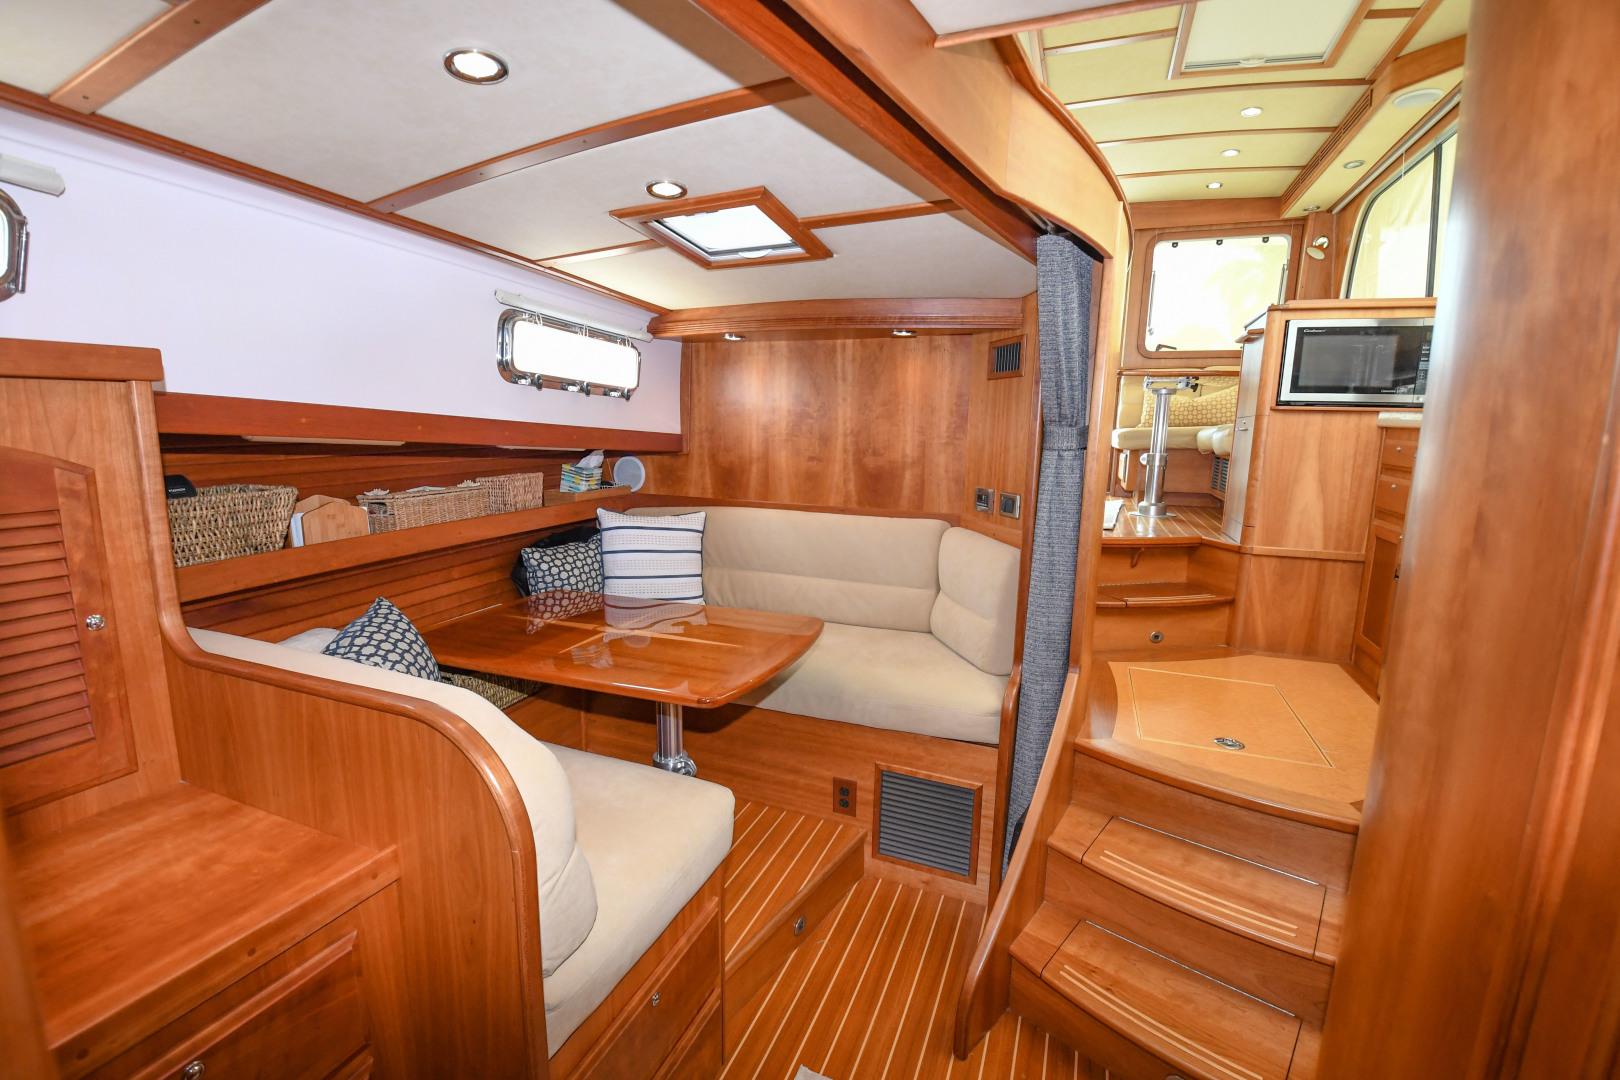 Sabre-40 Express 2010-Impulse Treasure Island-Florida-United States-2010 40 Sabre Express  Impulse  Lower Dinette-1618637 | Thumbnail